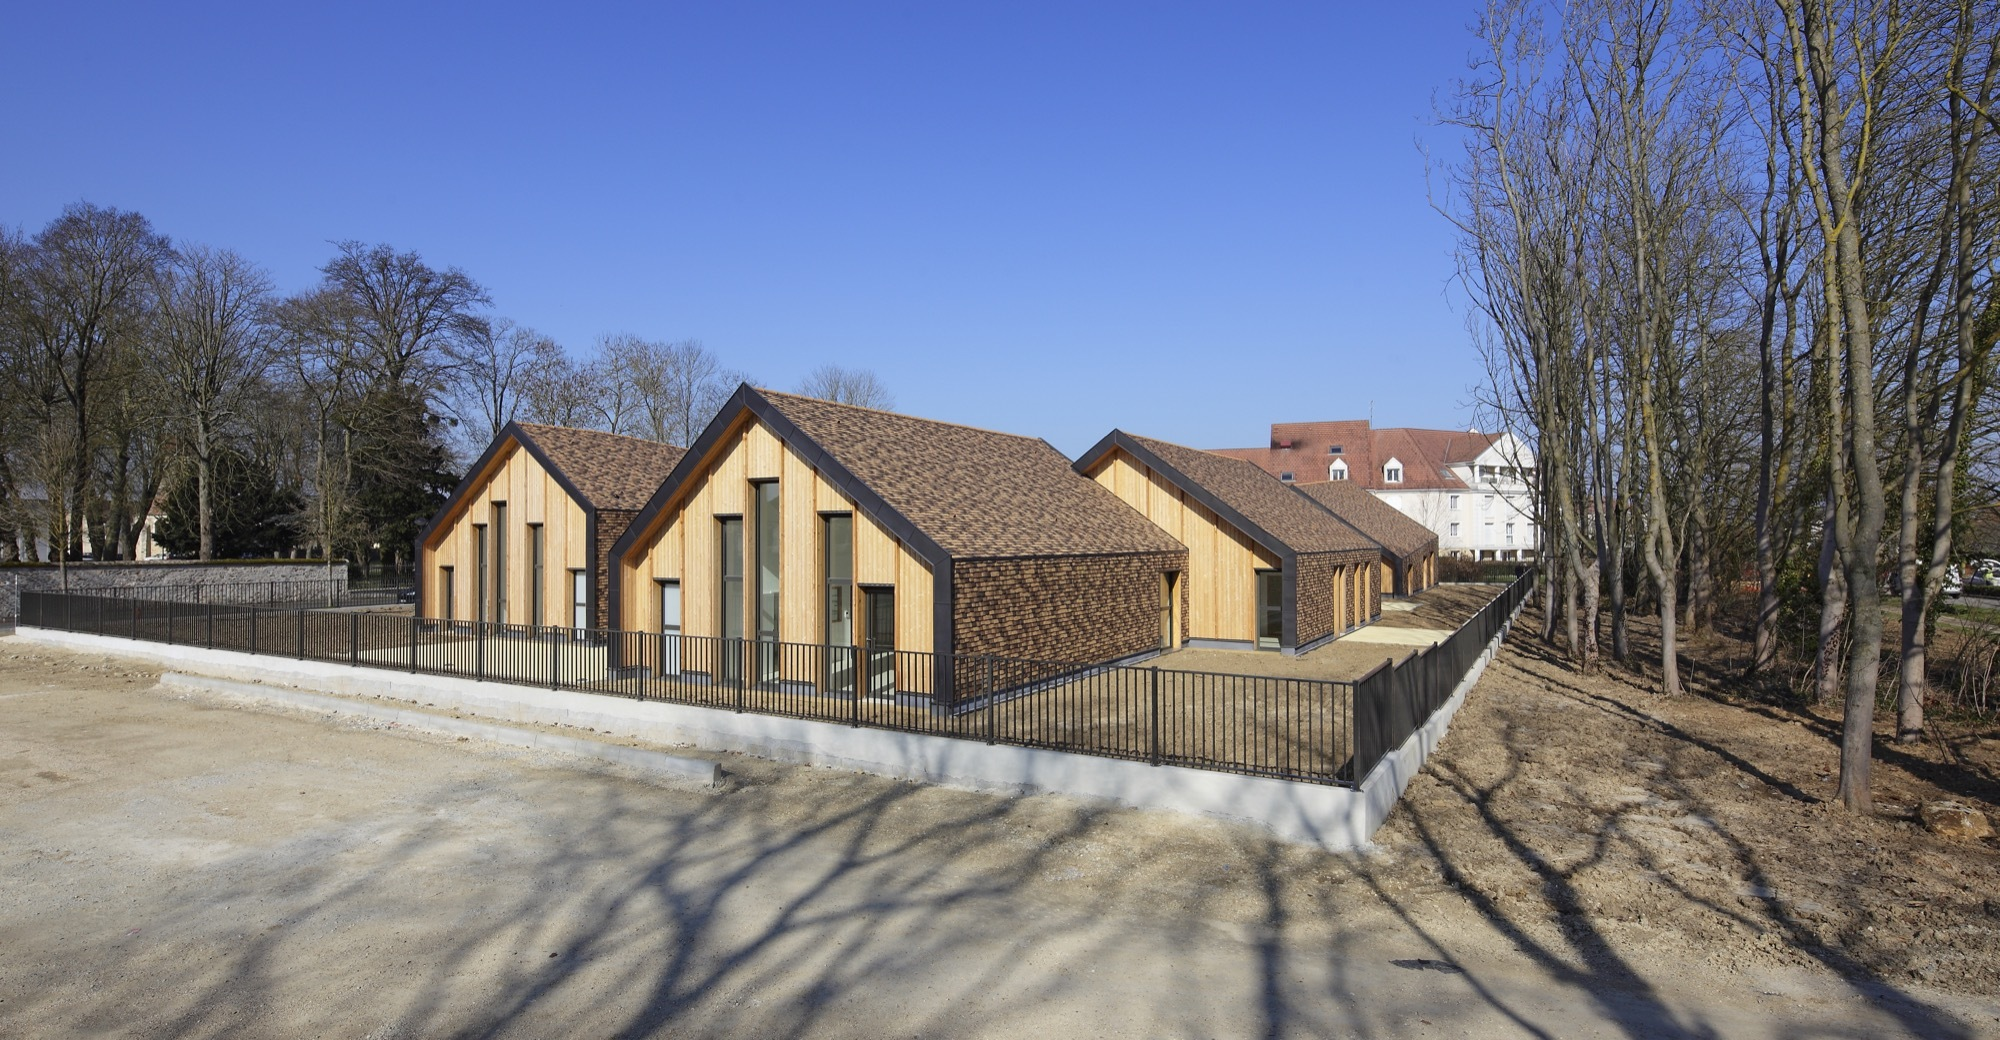 Gallery of maison de l enfance nomade architectes 13 for Architecture nomade